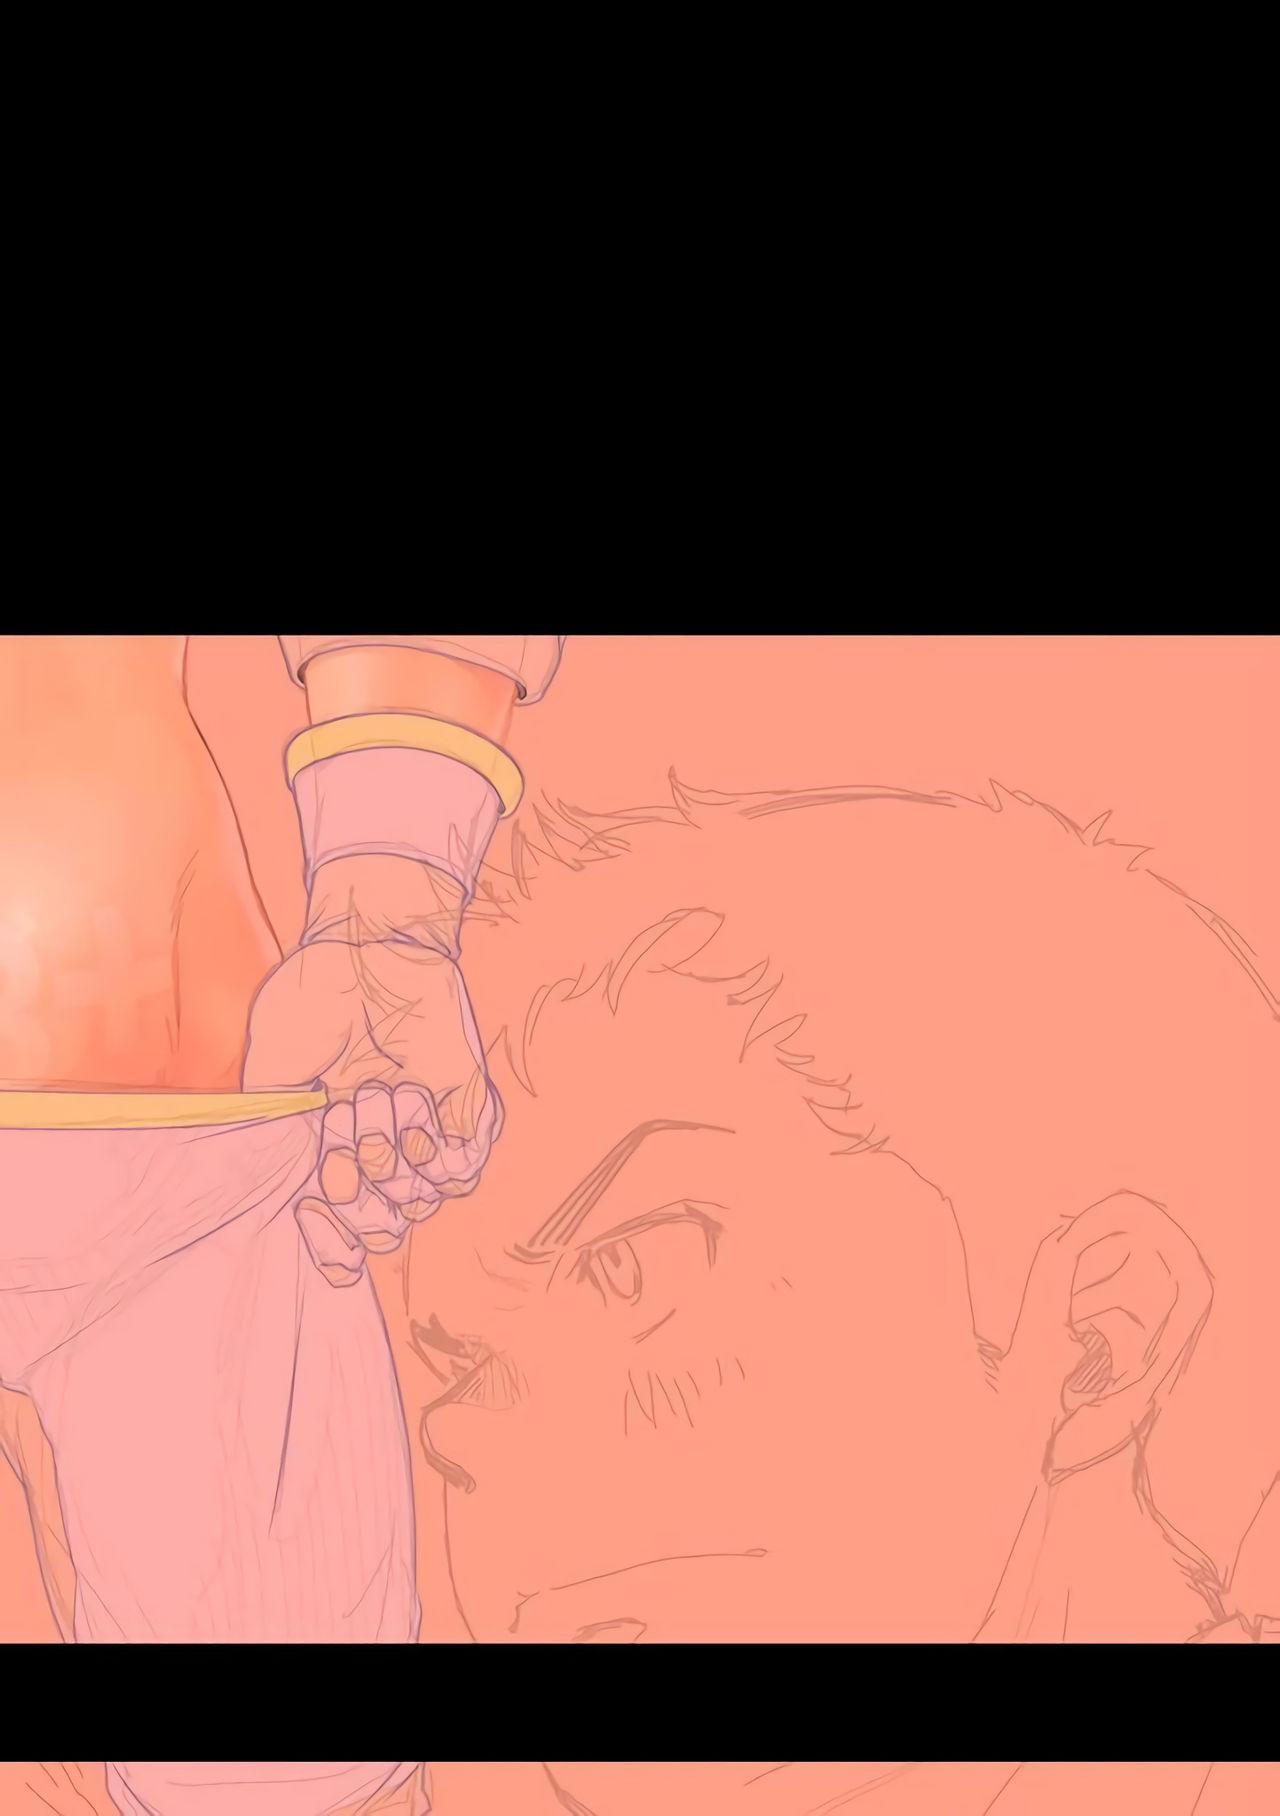 [Pagumiee (Kenta)] Tatakae!+++ (Plus-san)!! [English] [N04h] [Digital] 1